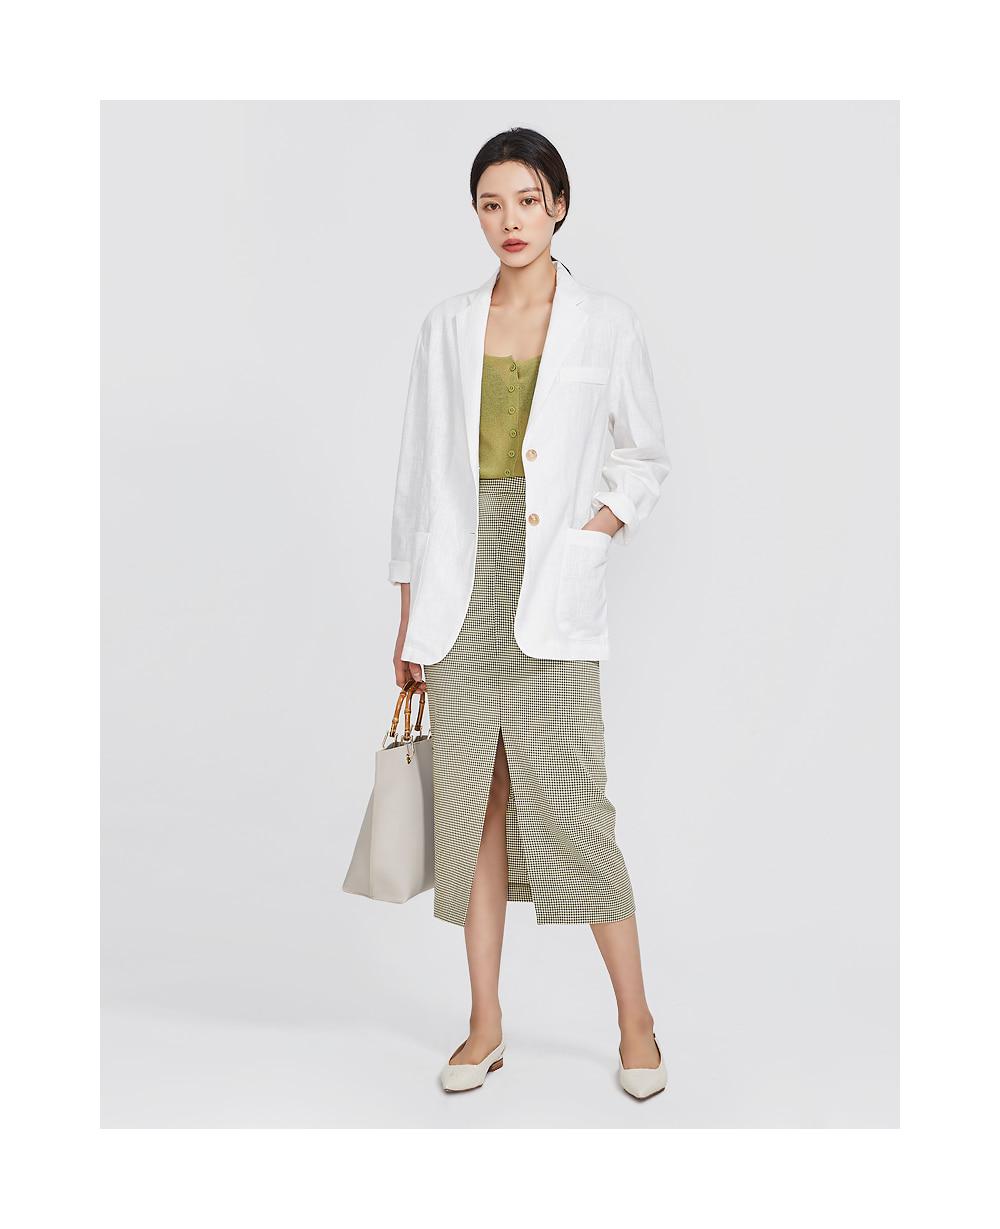 AIN - Korean Fashion - #Kfashion - Sense Shopper Bag